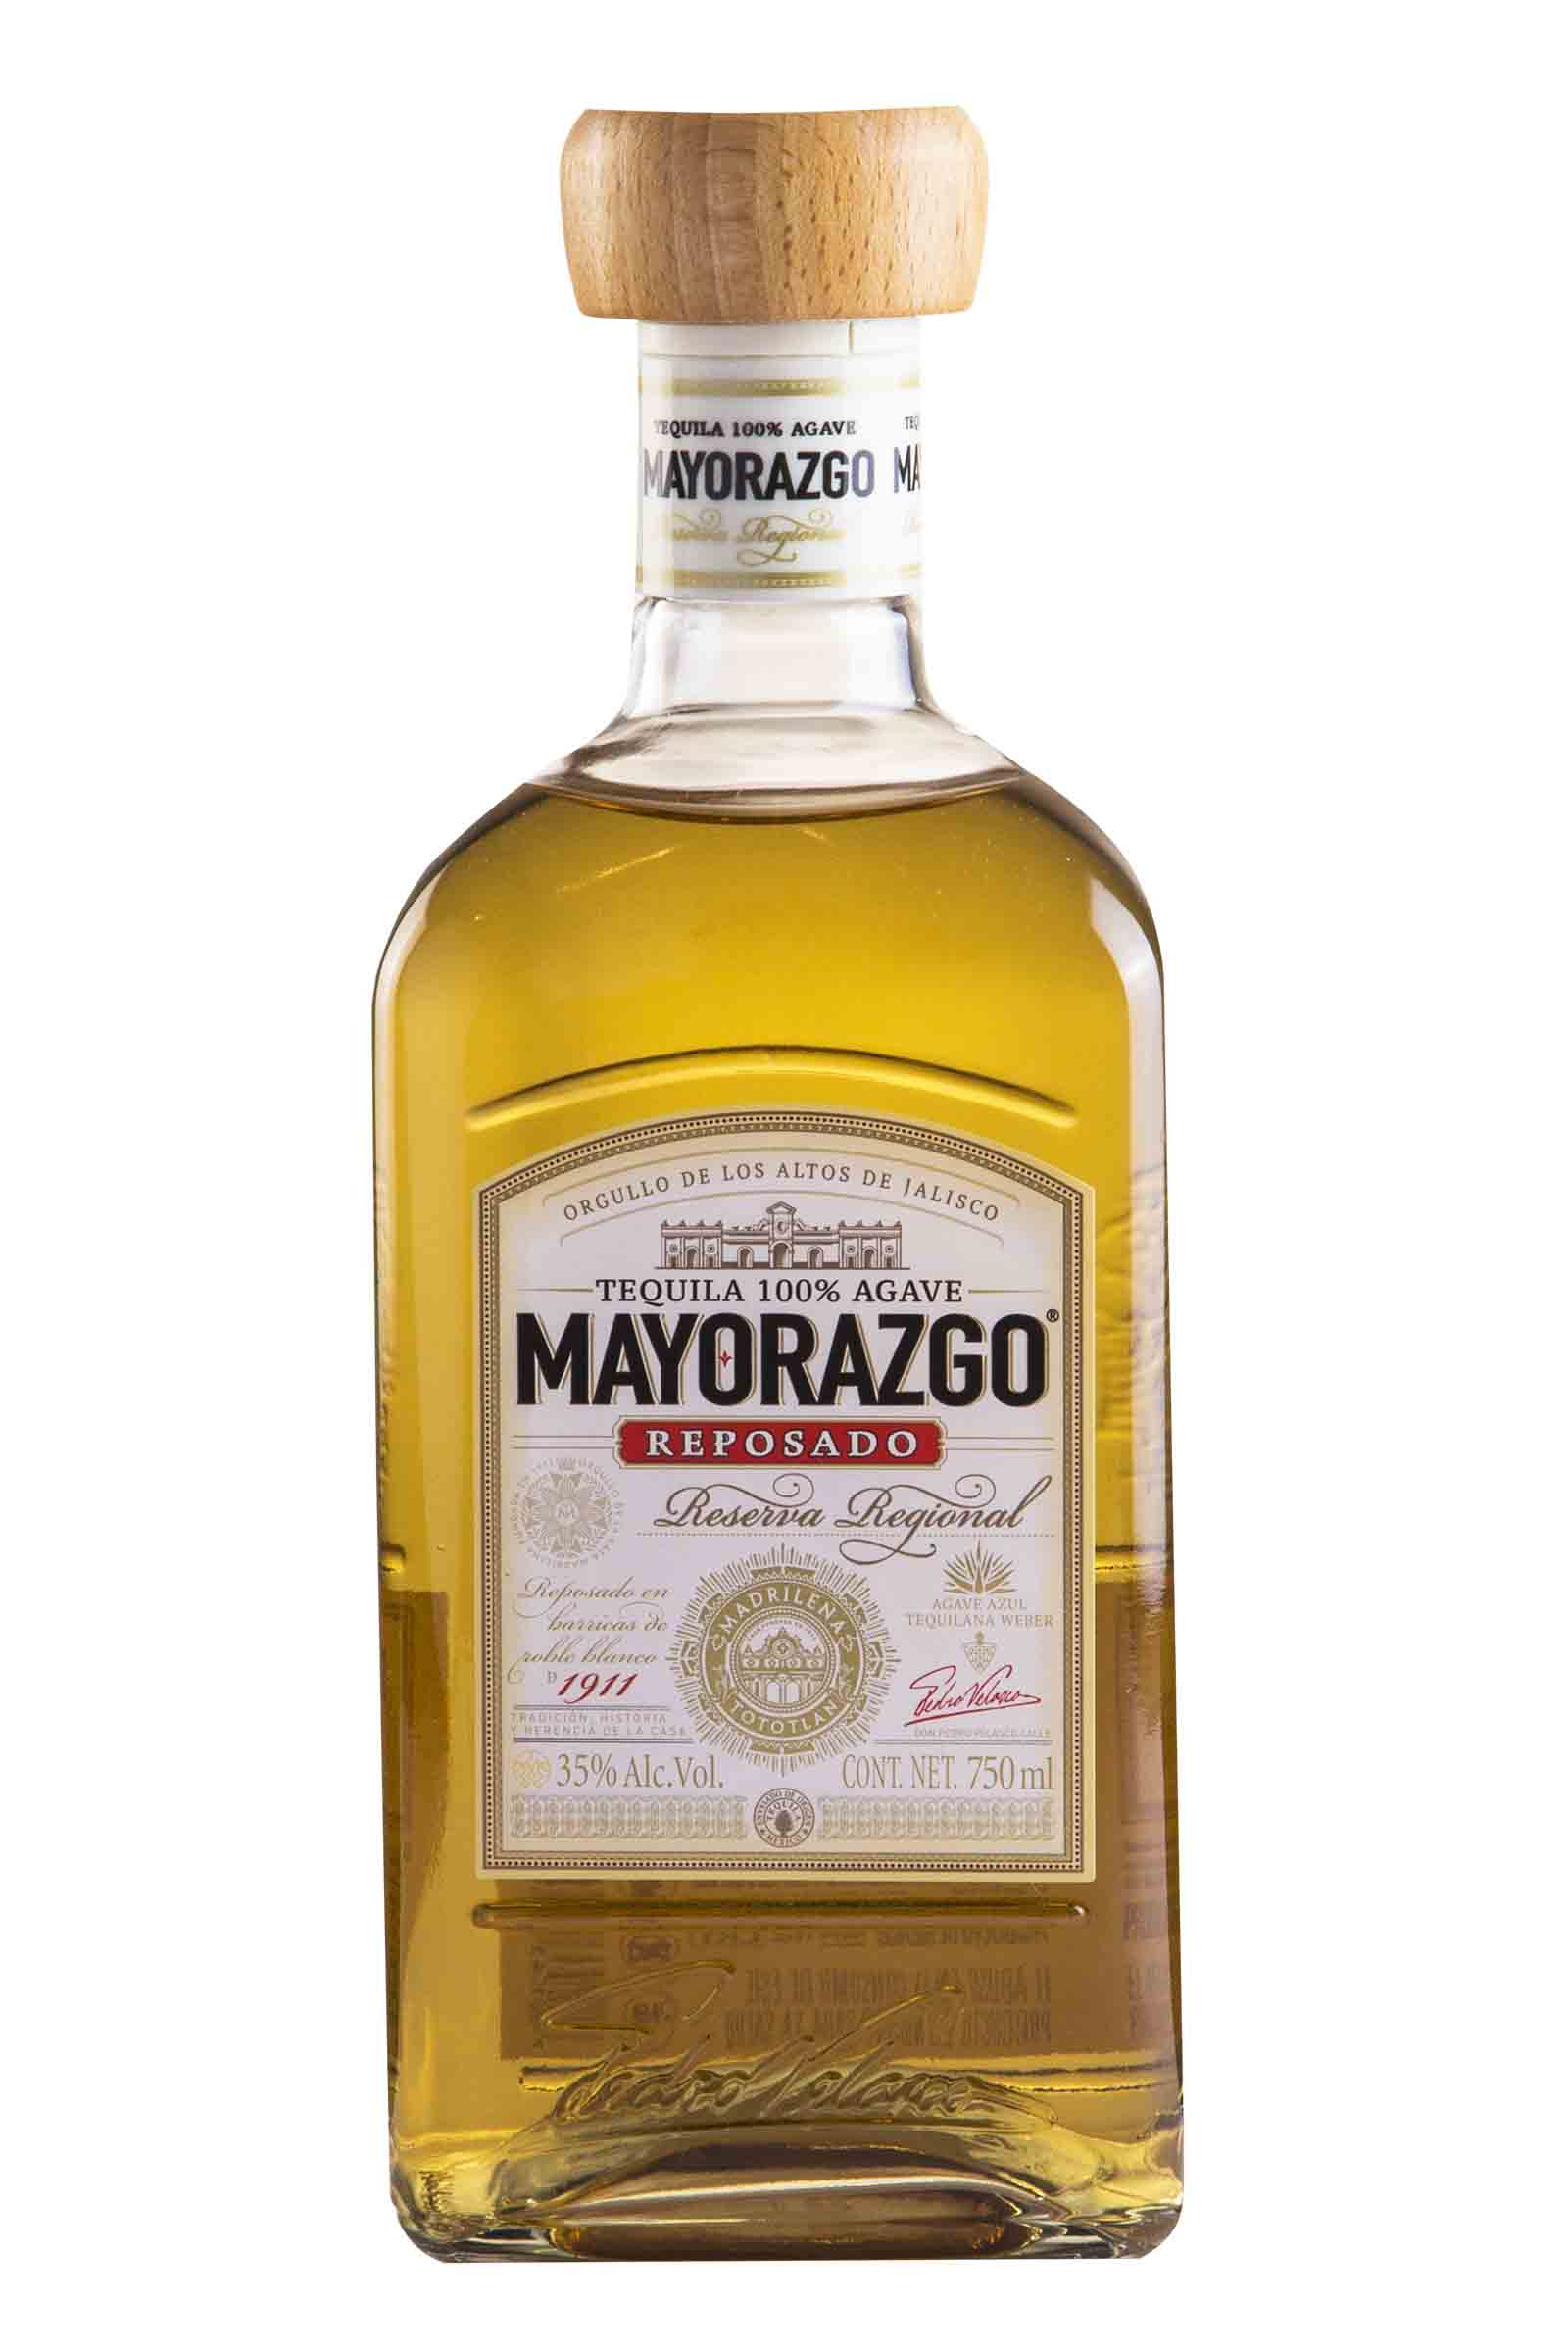 Tequila Mayorazgo Reposado 100% Agave 750ml